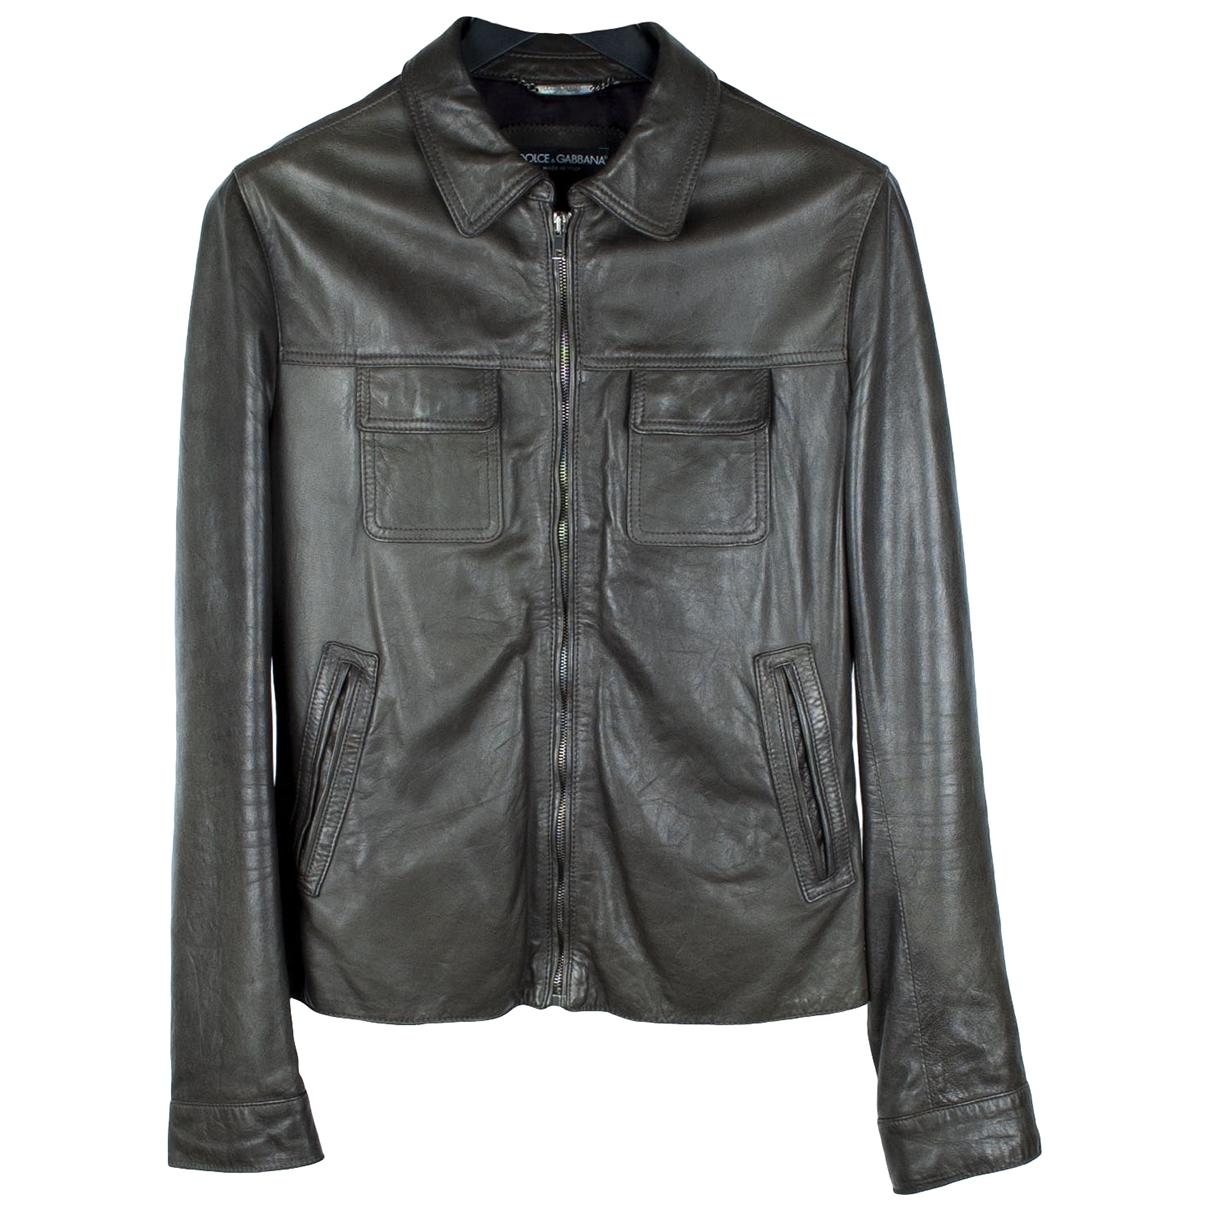 Dolce & Gabbana \N Khaki Leather jacket  for Men M International